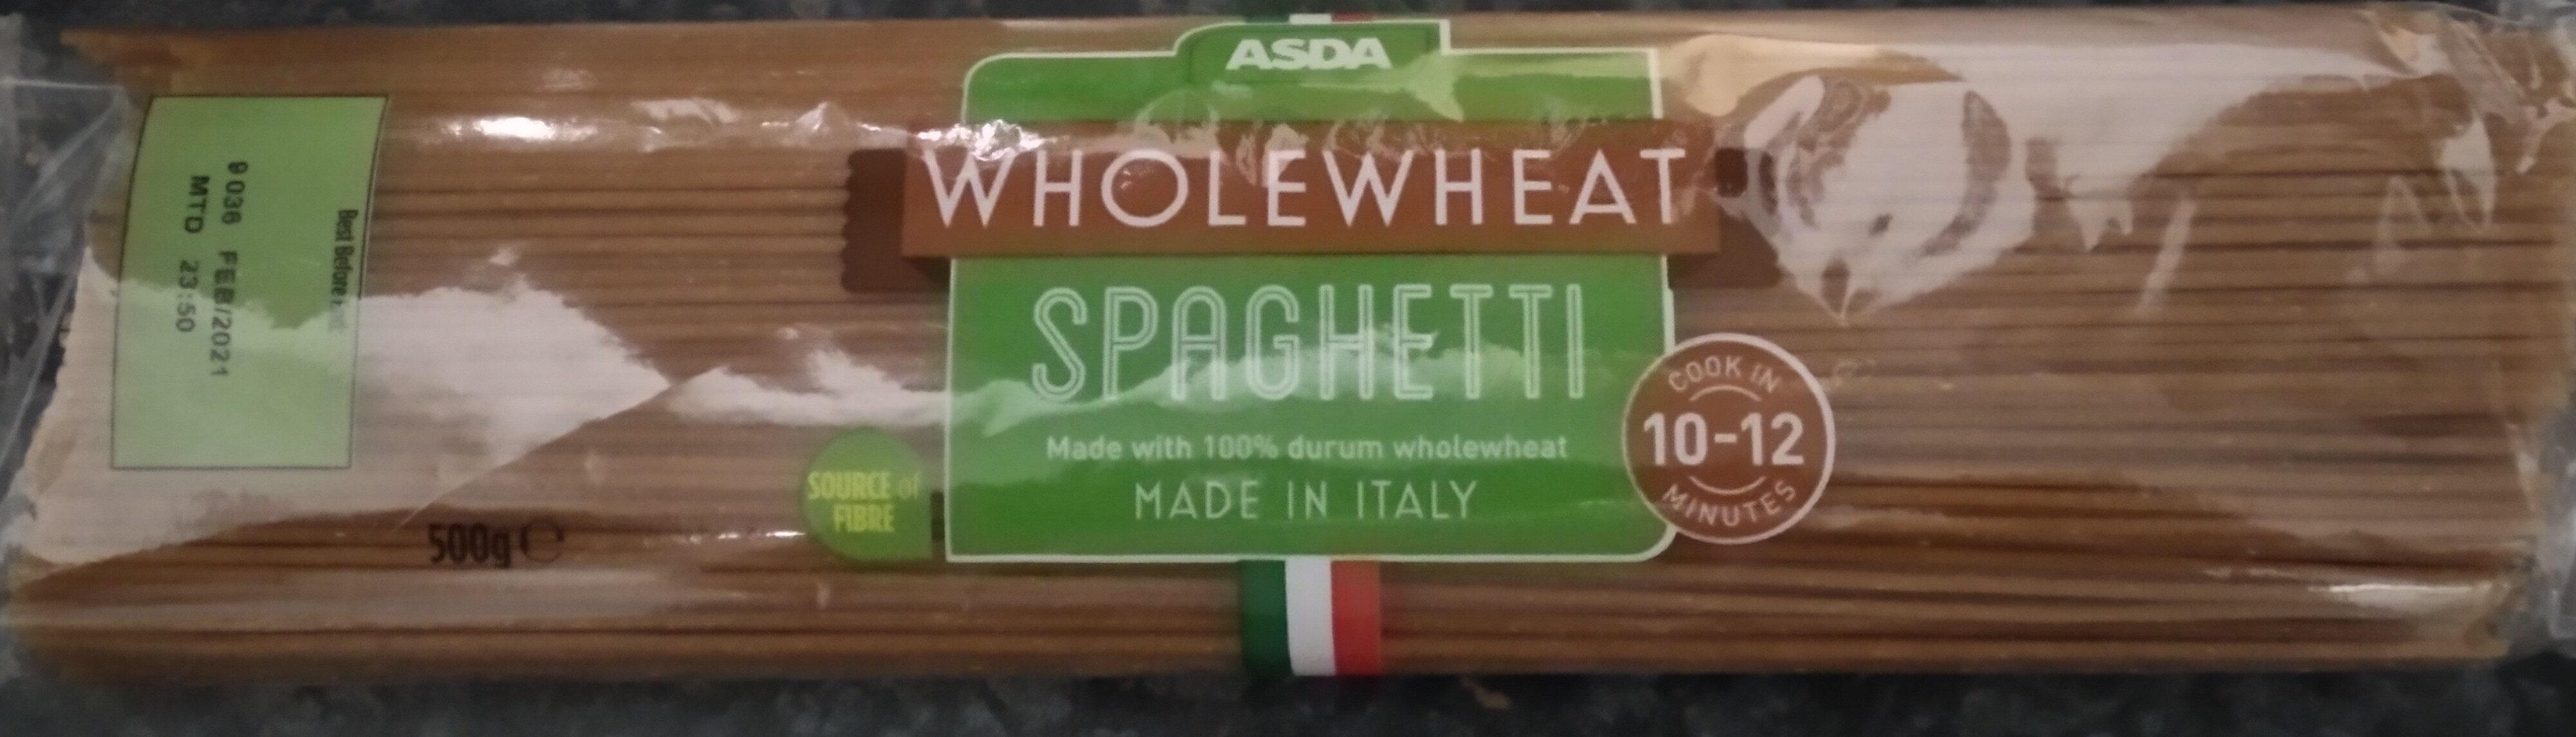 Wholewheat spaghetti - Product